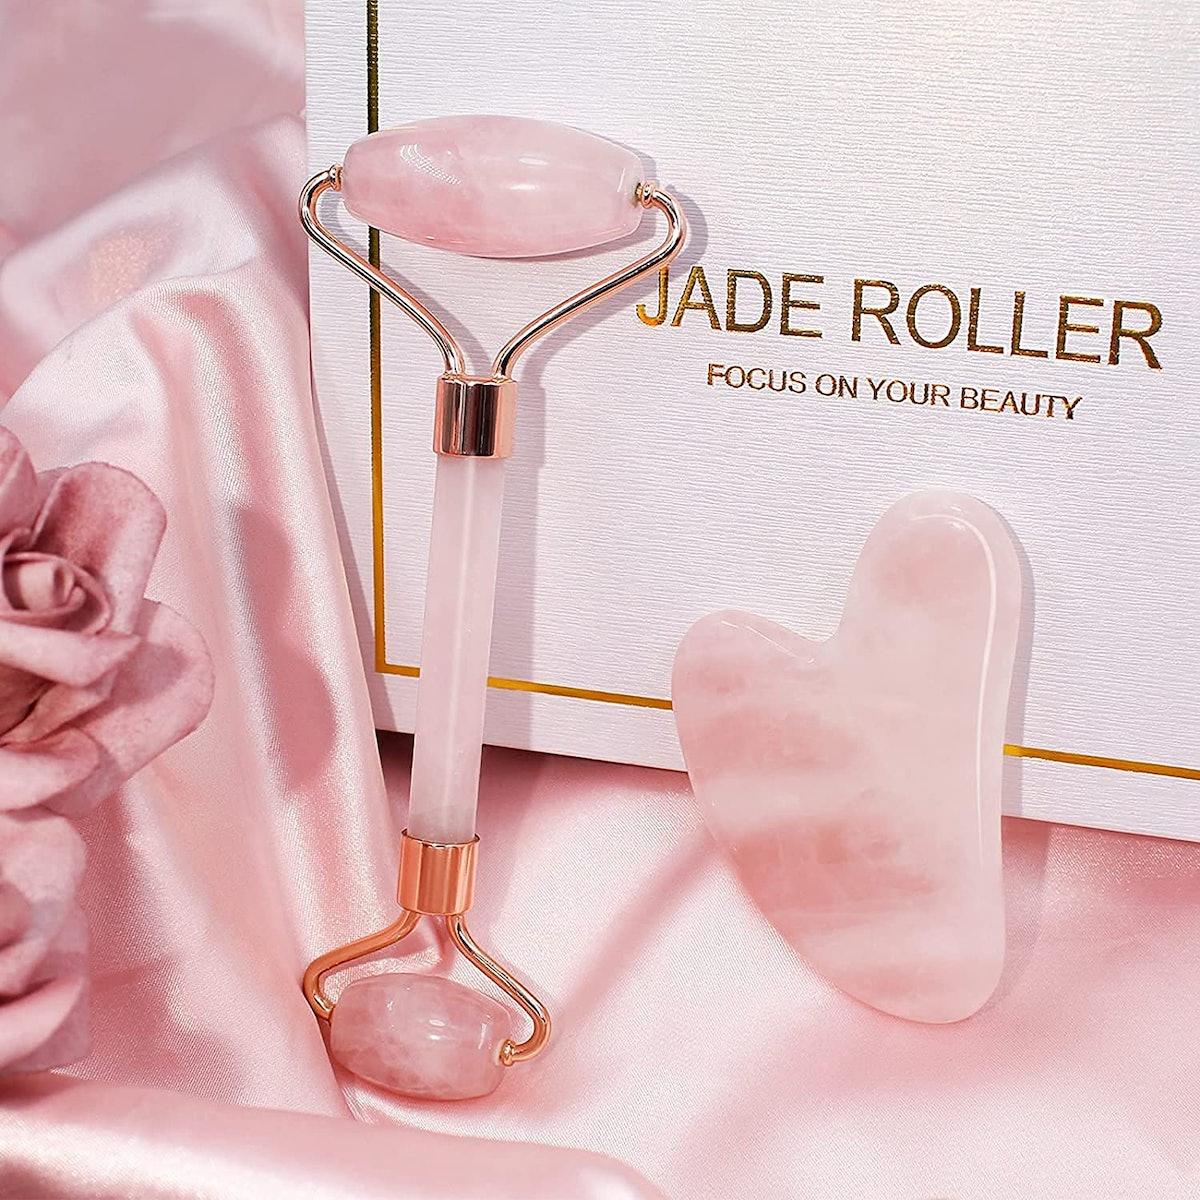 BAIMEI Rose Quartz Jade Roller & Gua Sha Set